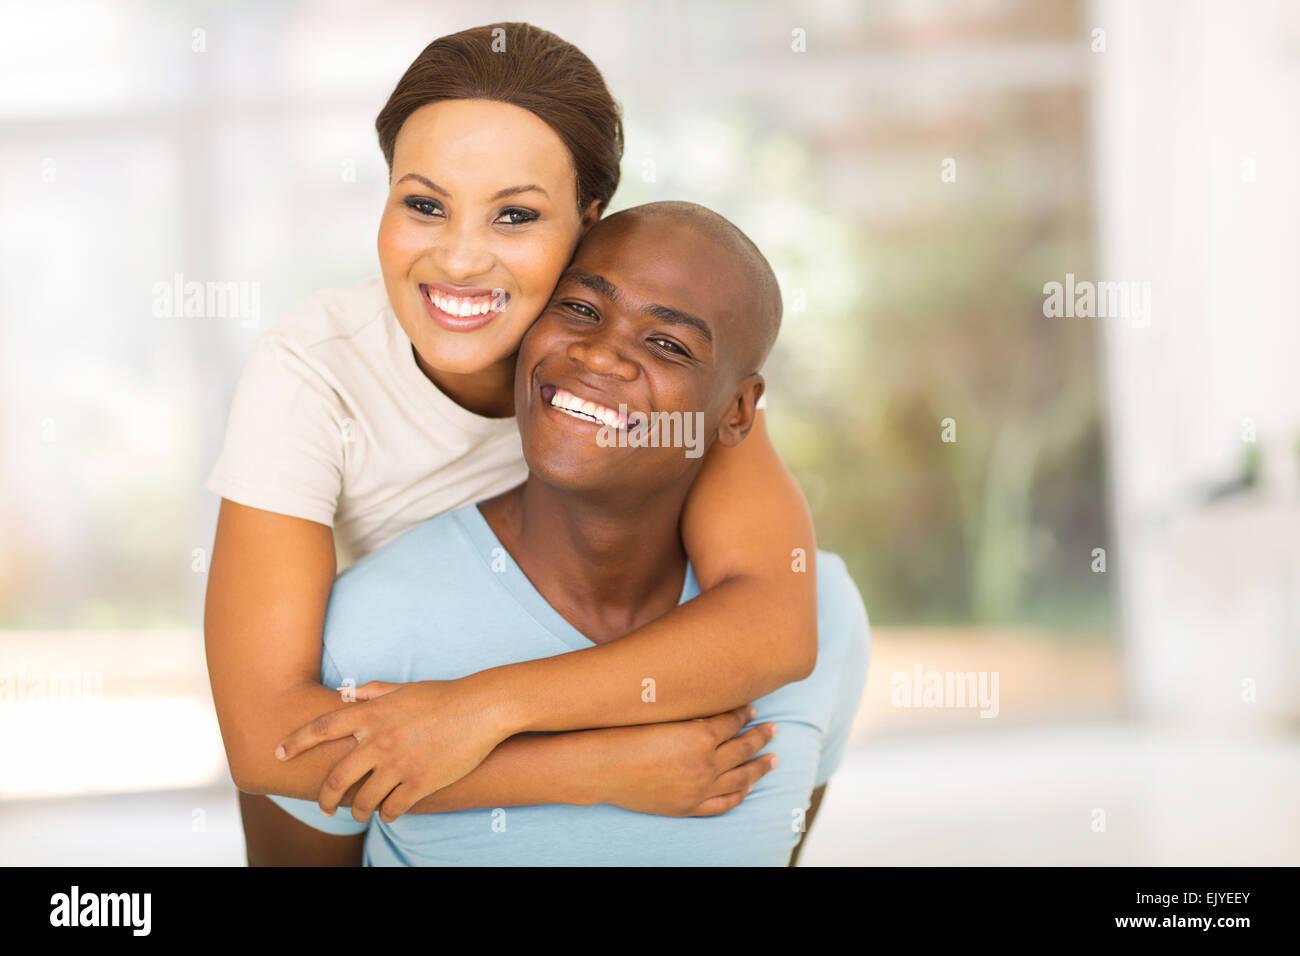 happy African woman enjoying piggyback ride on boyfriend - Stock Image